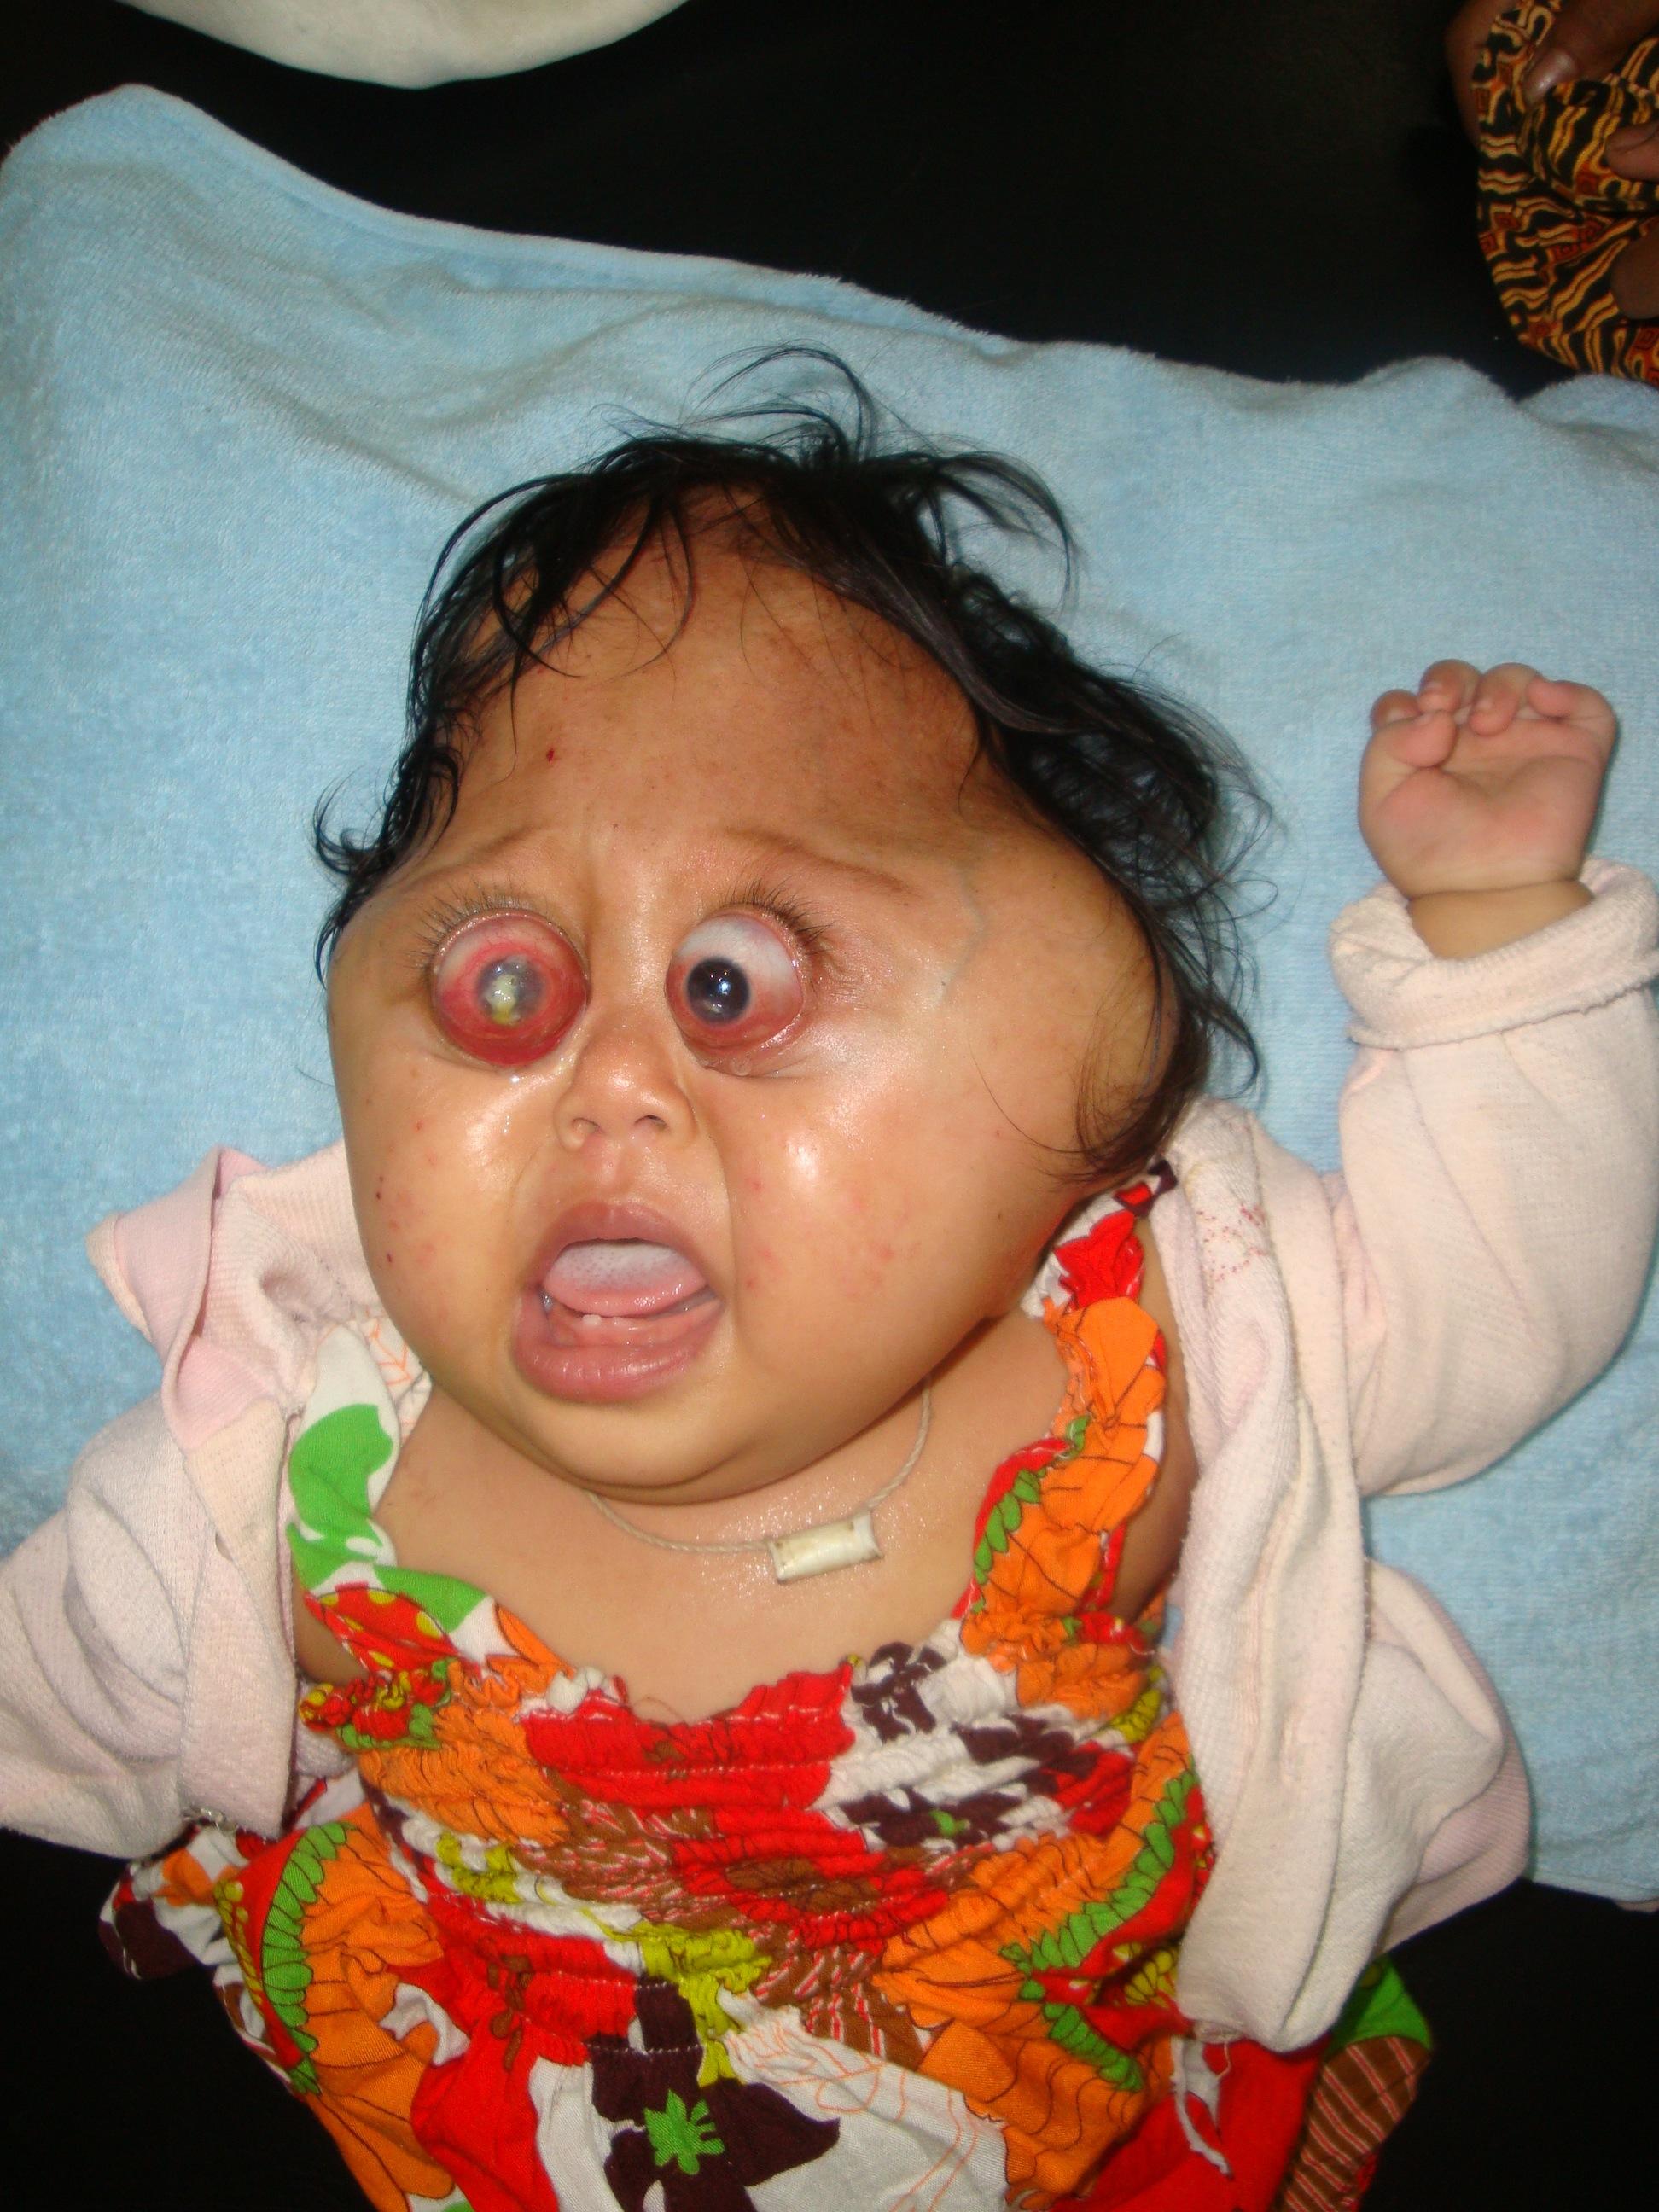 File:Crouzon Syndrome.jpg - Wikimedia Commons